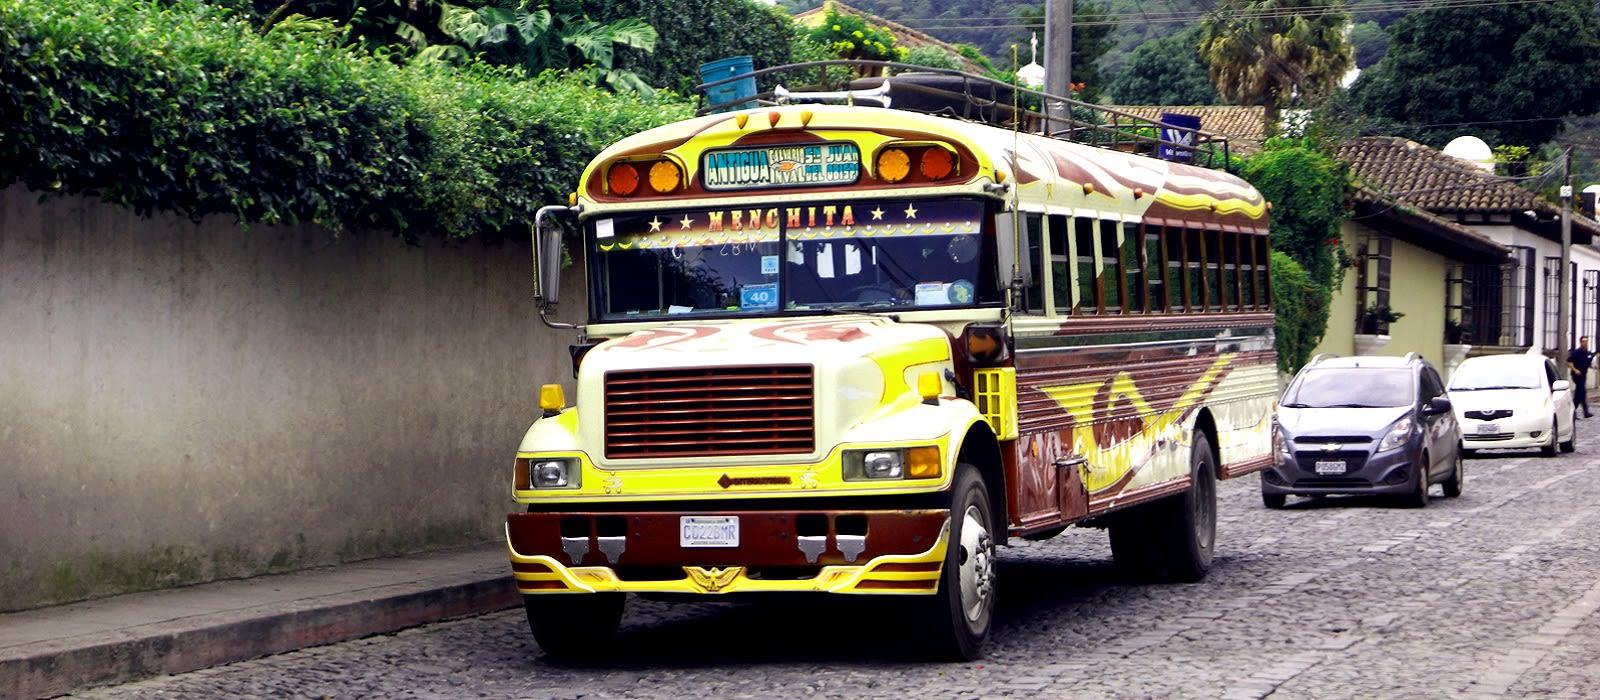 Lakeside Paradise and Antigua Tour Trip 5